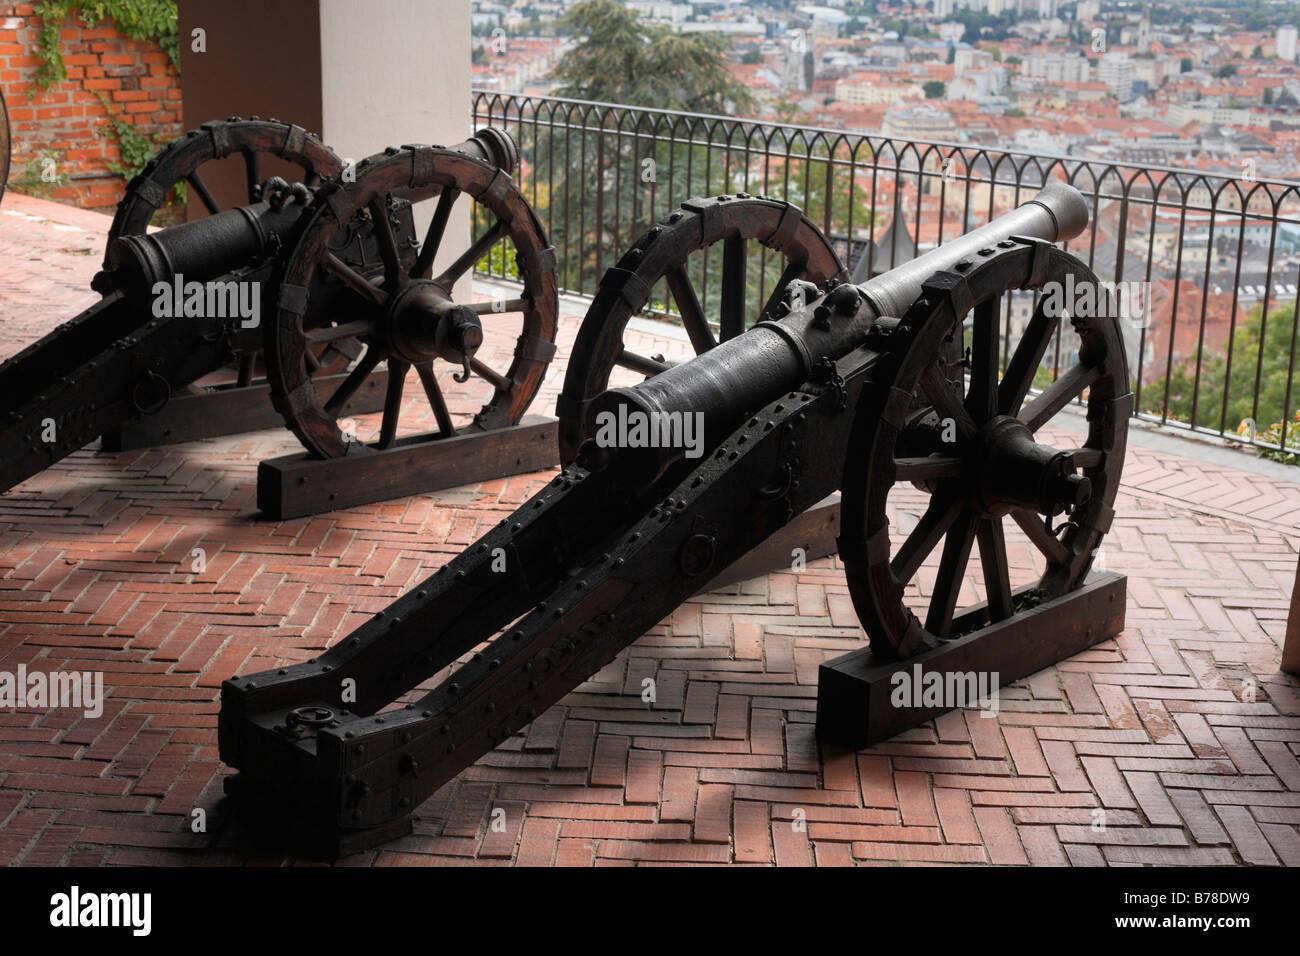 Cannons on Schlossberg, castle mountain, Graz, Styria, Austria, EuropeStock Photo